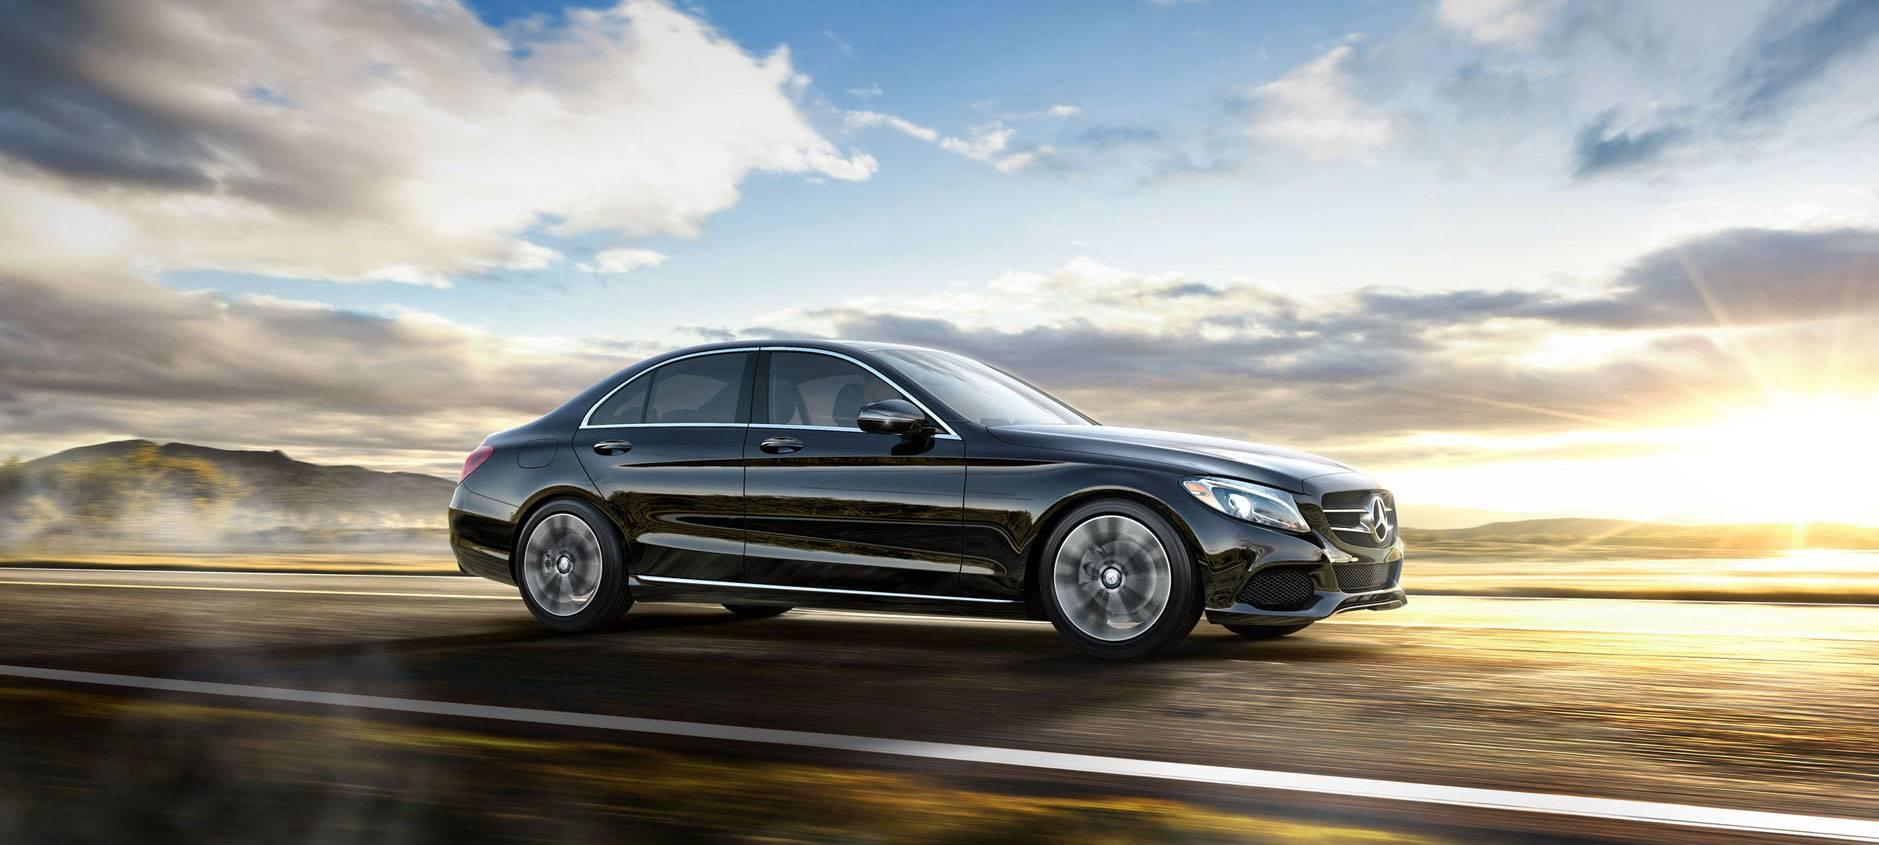 2017 mercedes benz c class mercedes benz of birmingham for Mercedes benz of birmingham hoover al